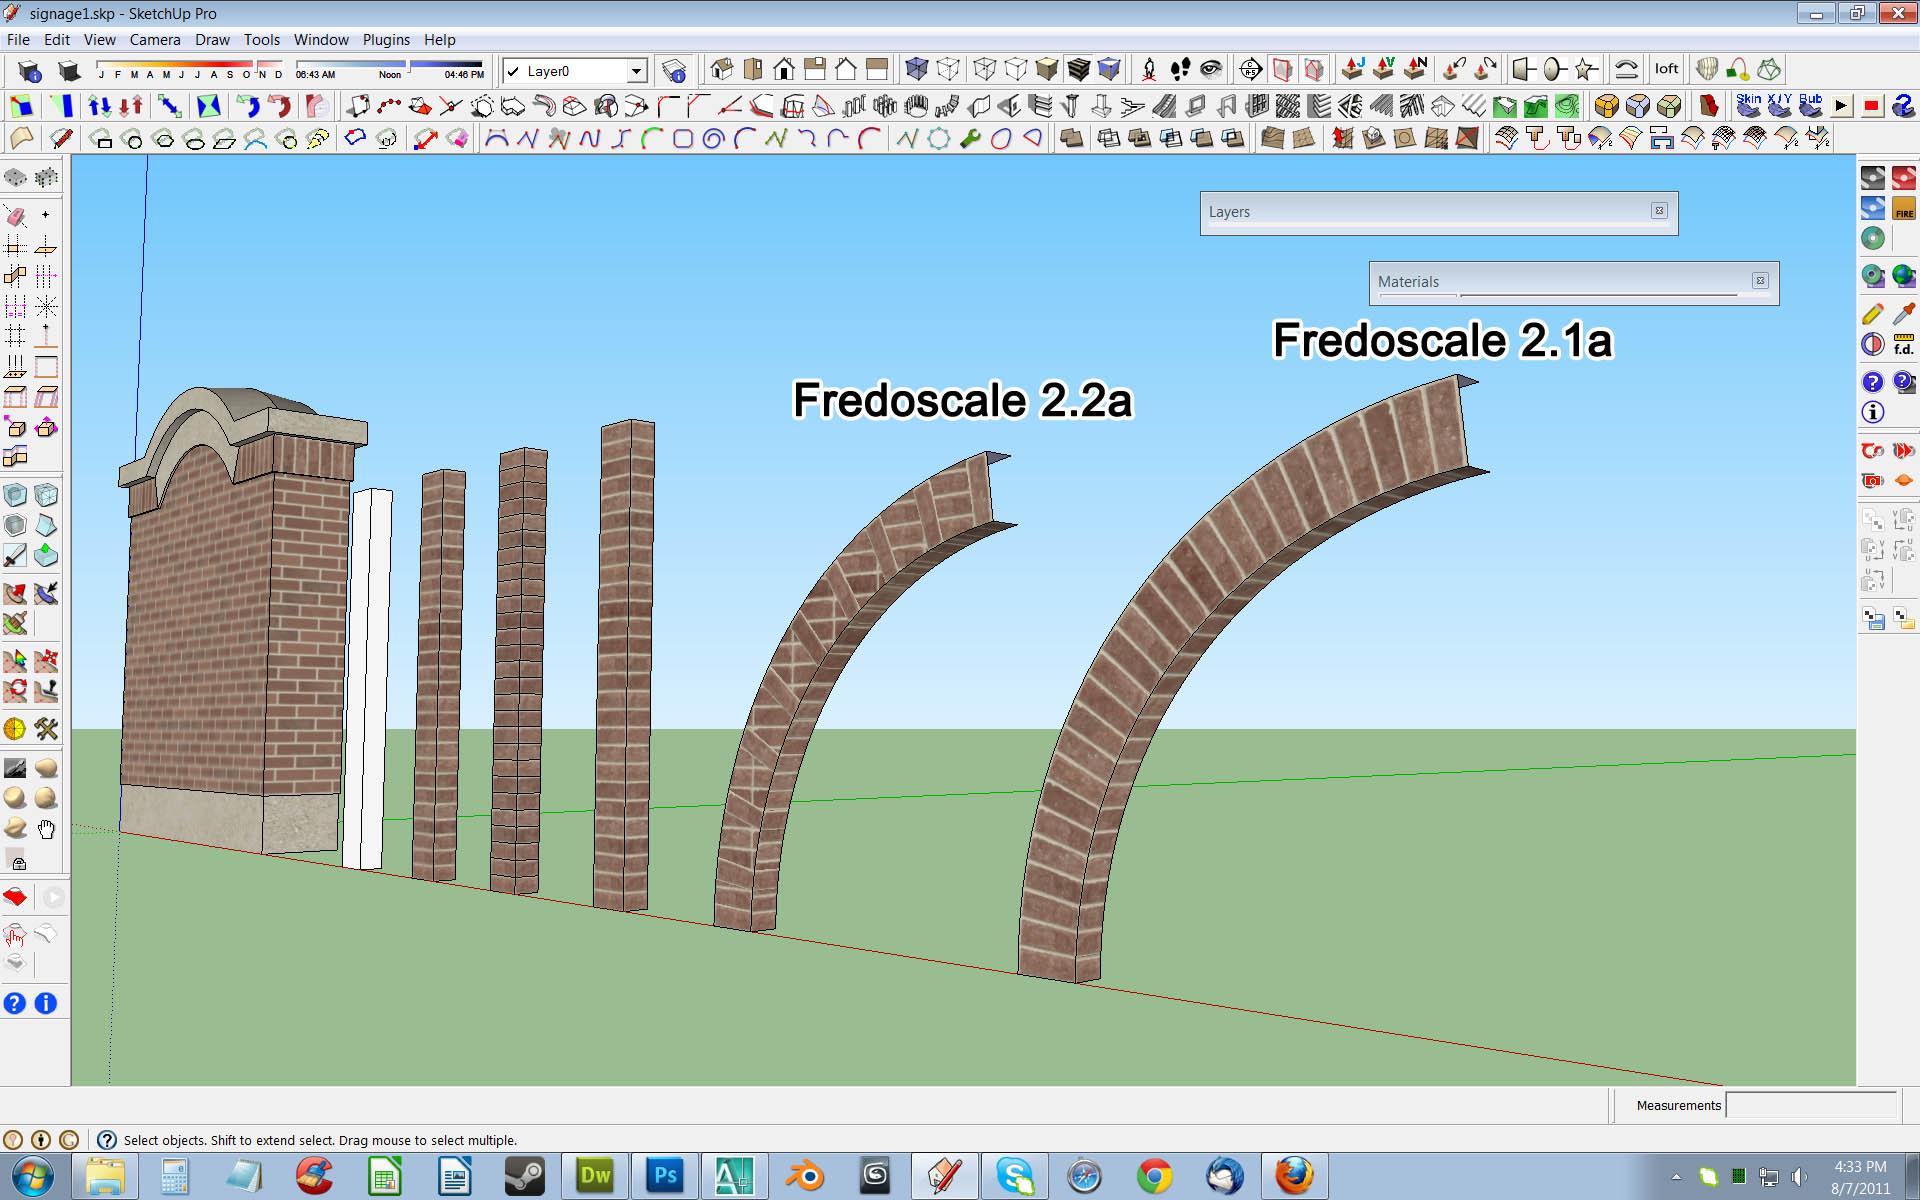 fredoscale 2.2a